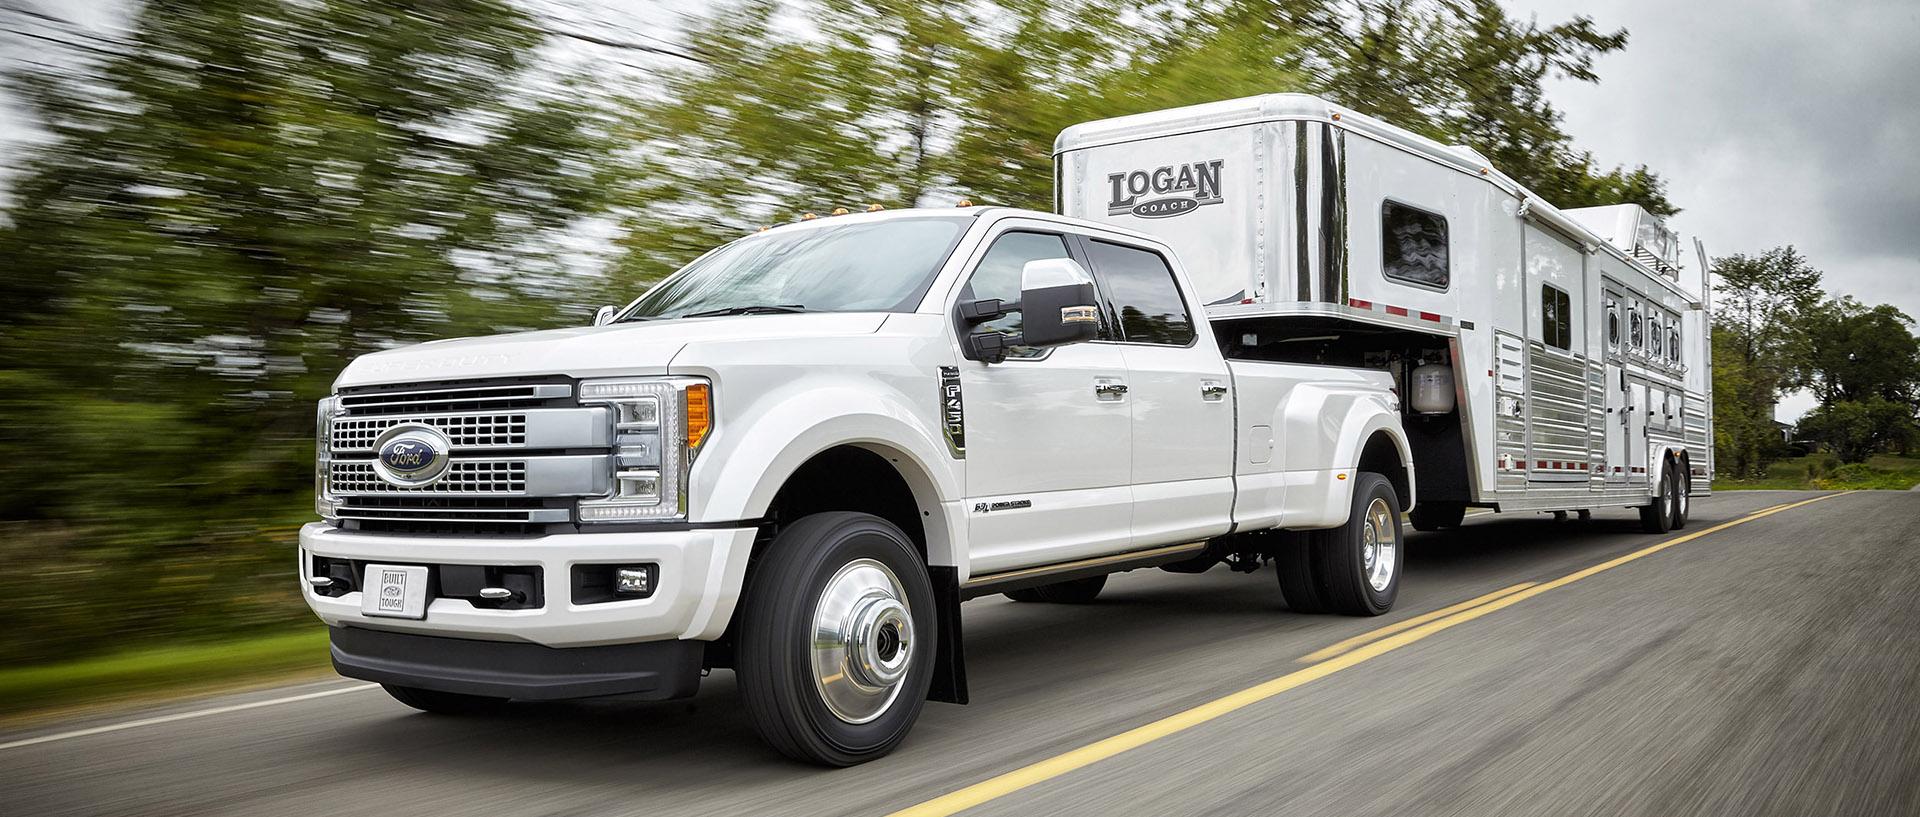 2017 Ford Super Duty Pickup Truck Goes Aluminum Consumer